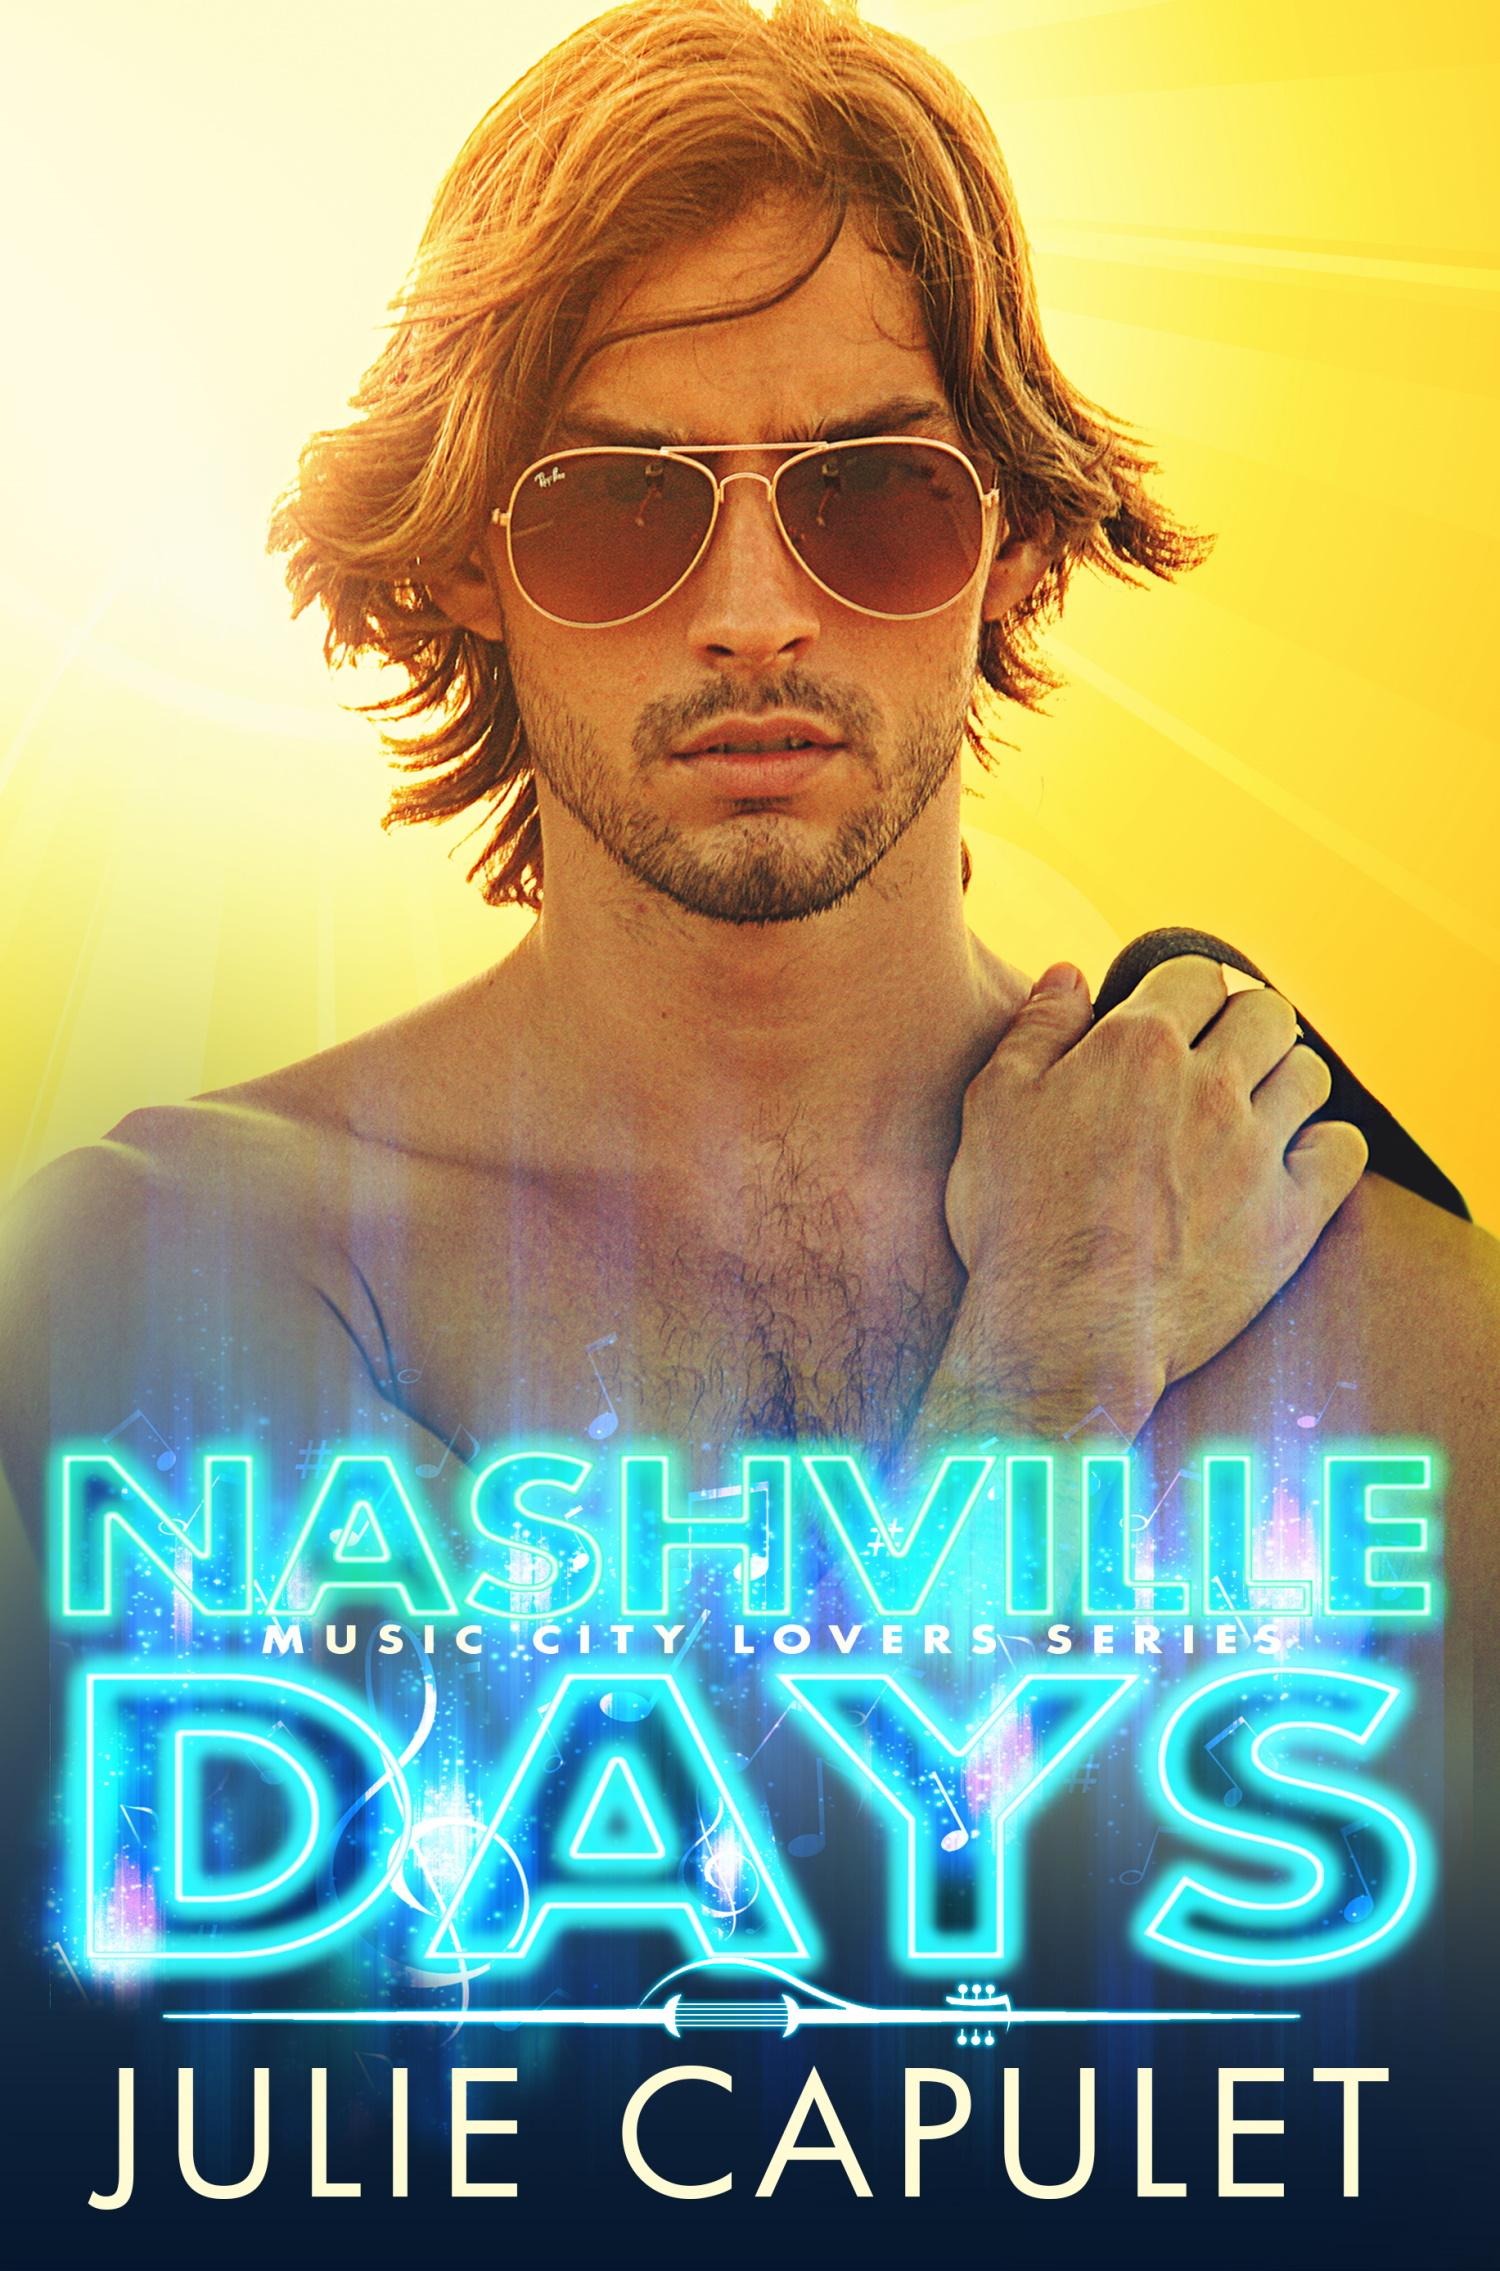 Nashville Days (Music City Lovers #1)